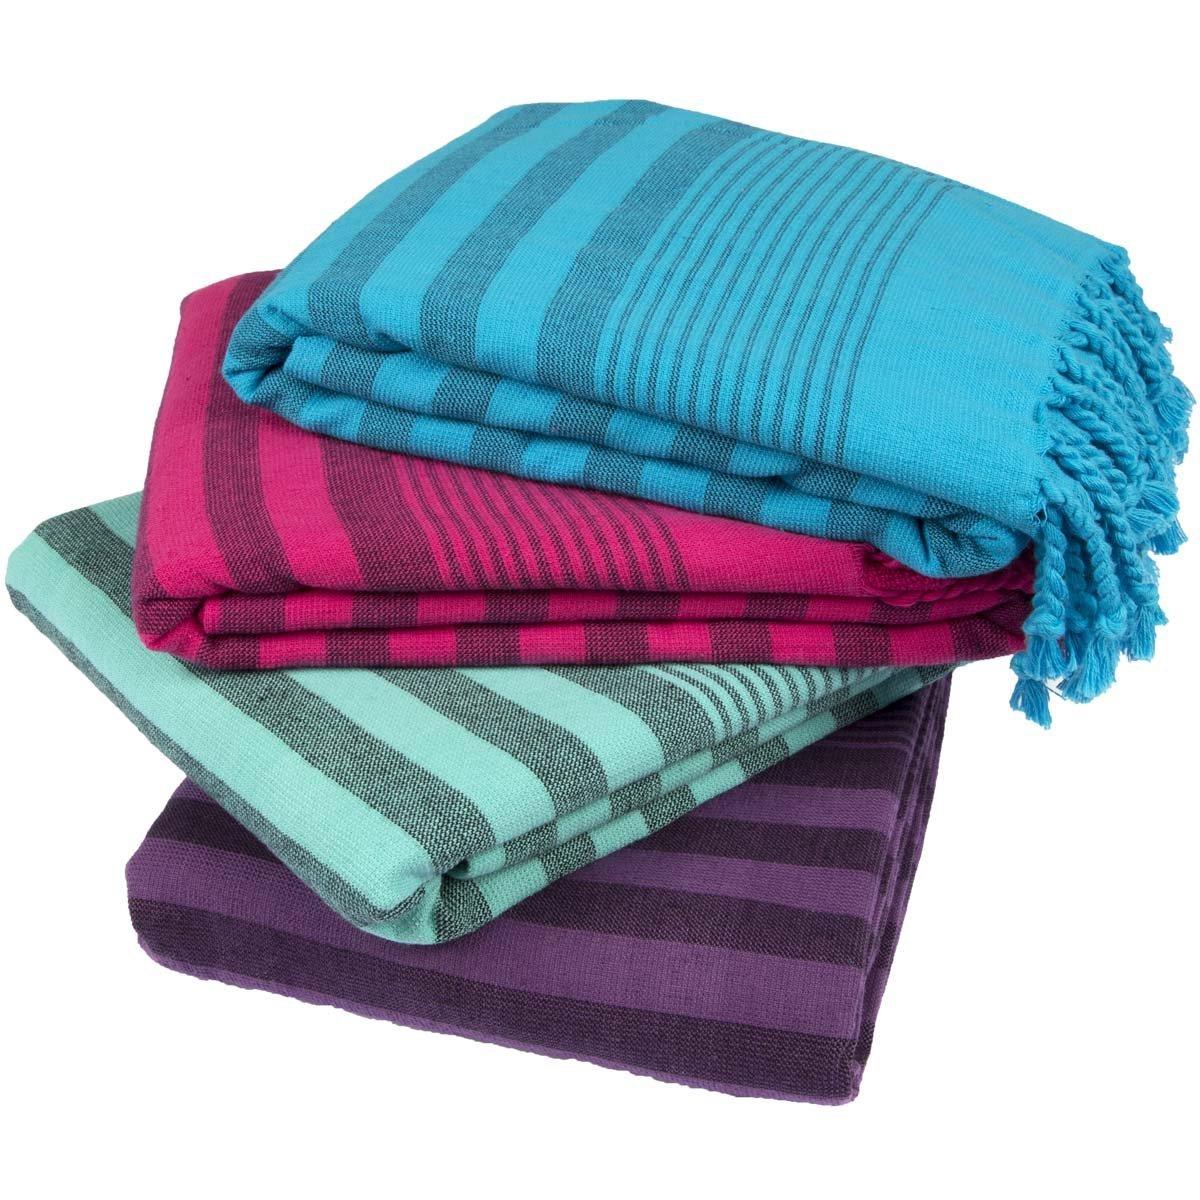 Turkish Towel Set of 4 Bath and Beach Towels - $39.95